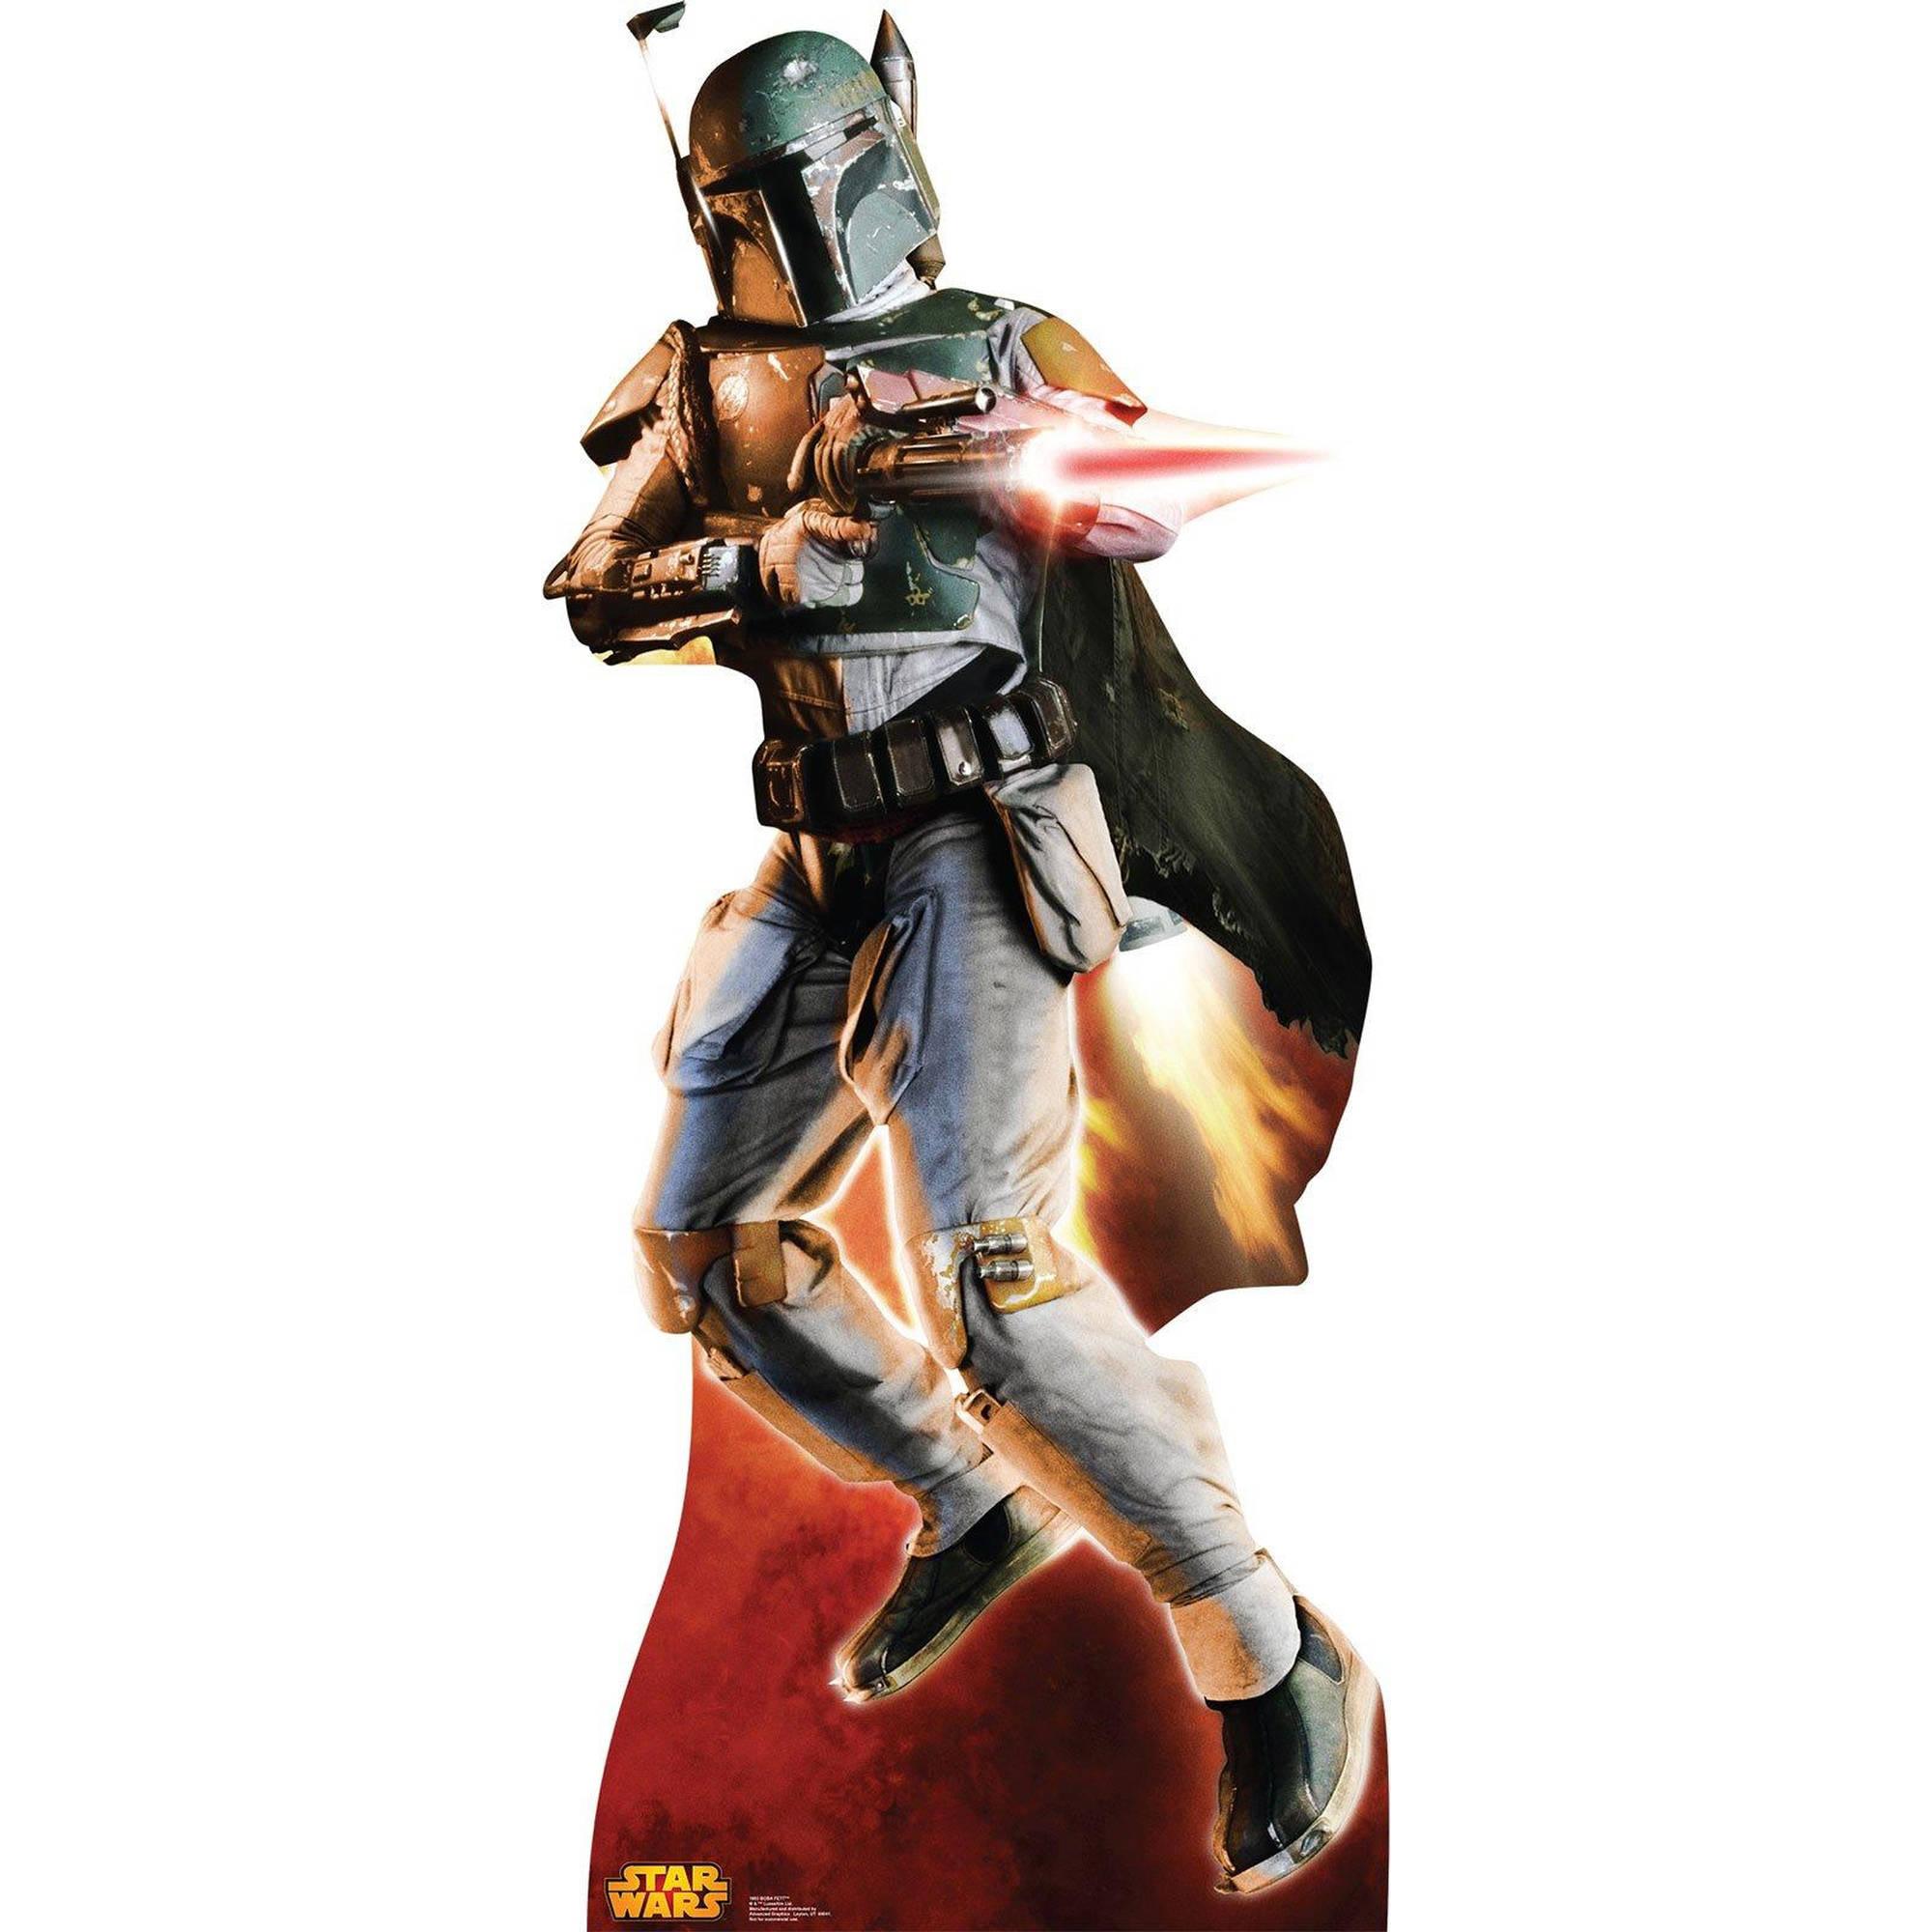 Star Wars Boba Fett Stand Up, 6' Tall